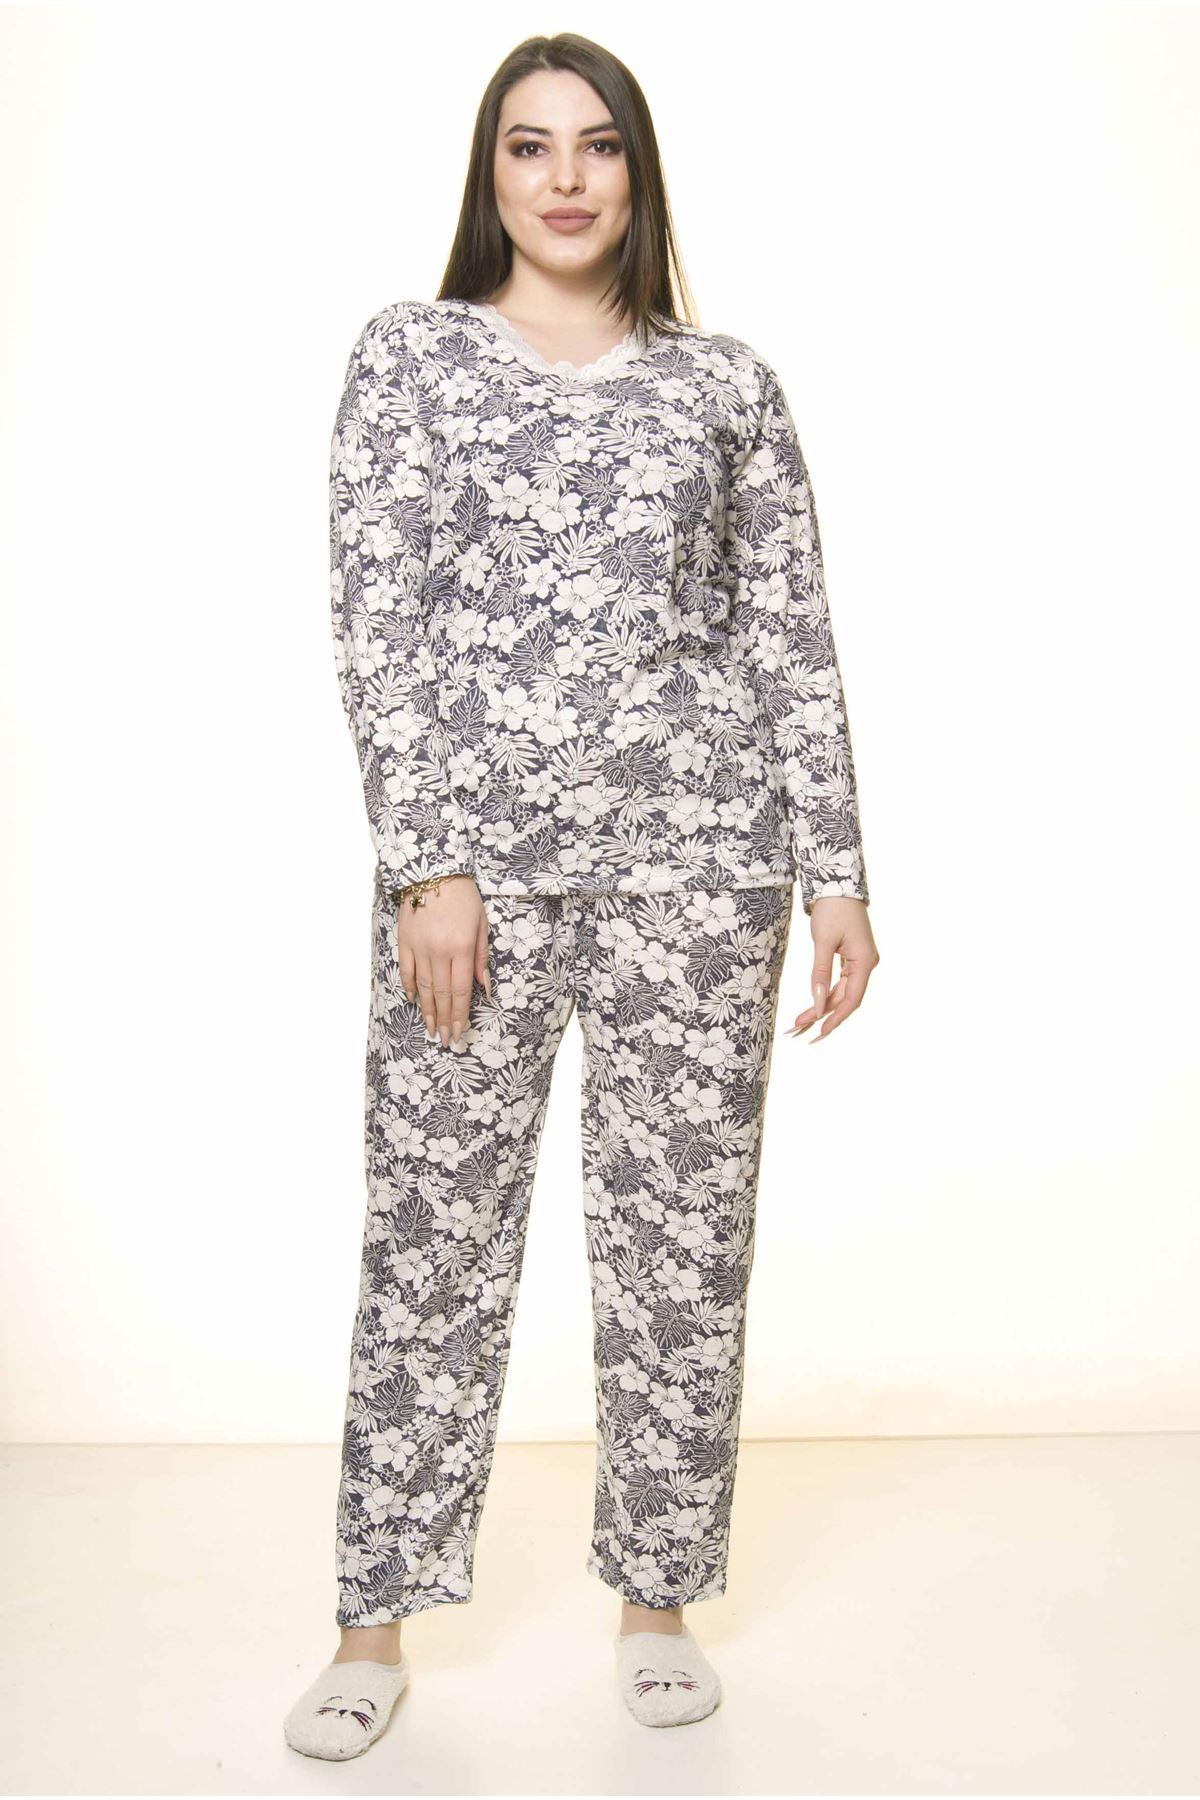 Geniş Kesim Pijama Takımı 31A-1561